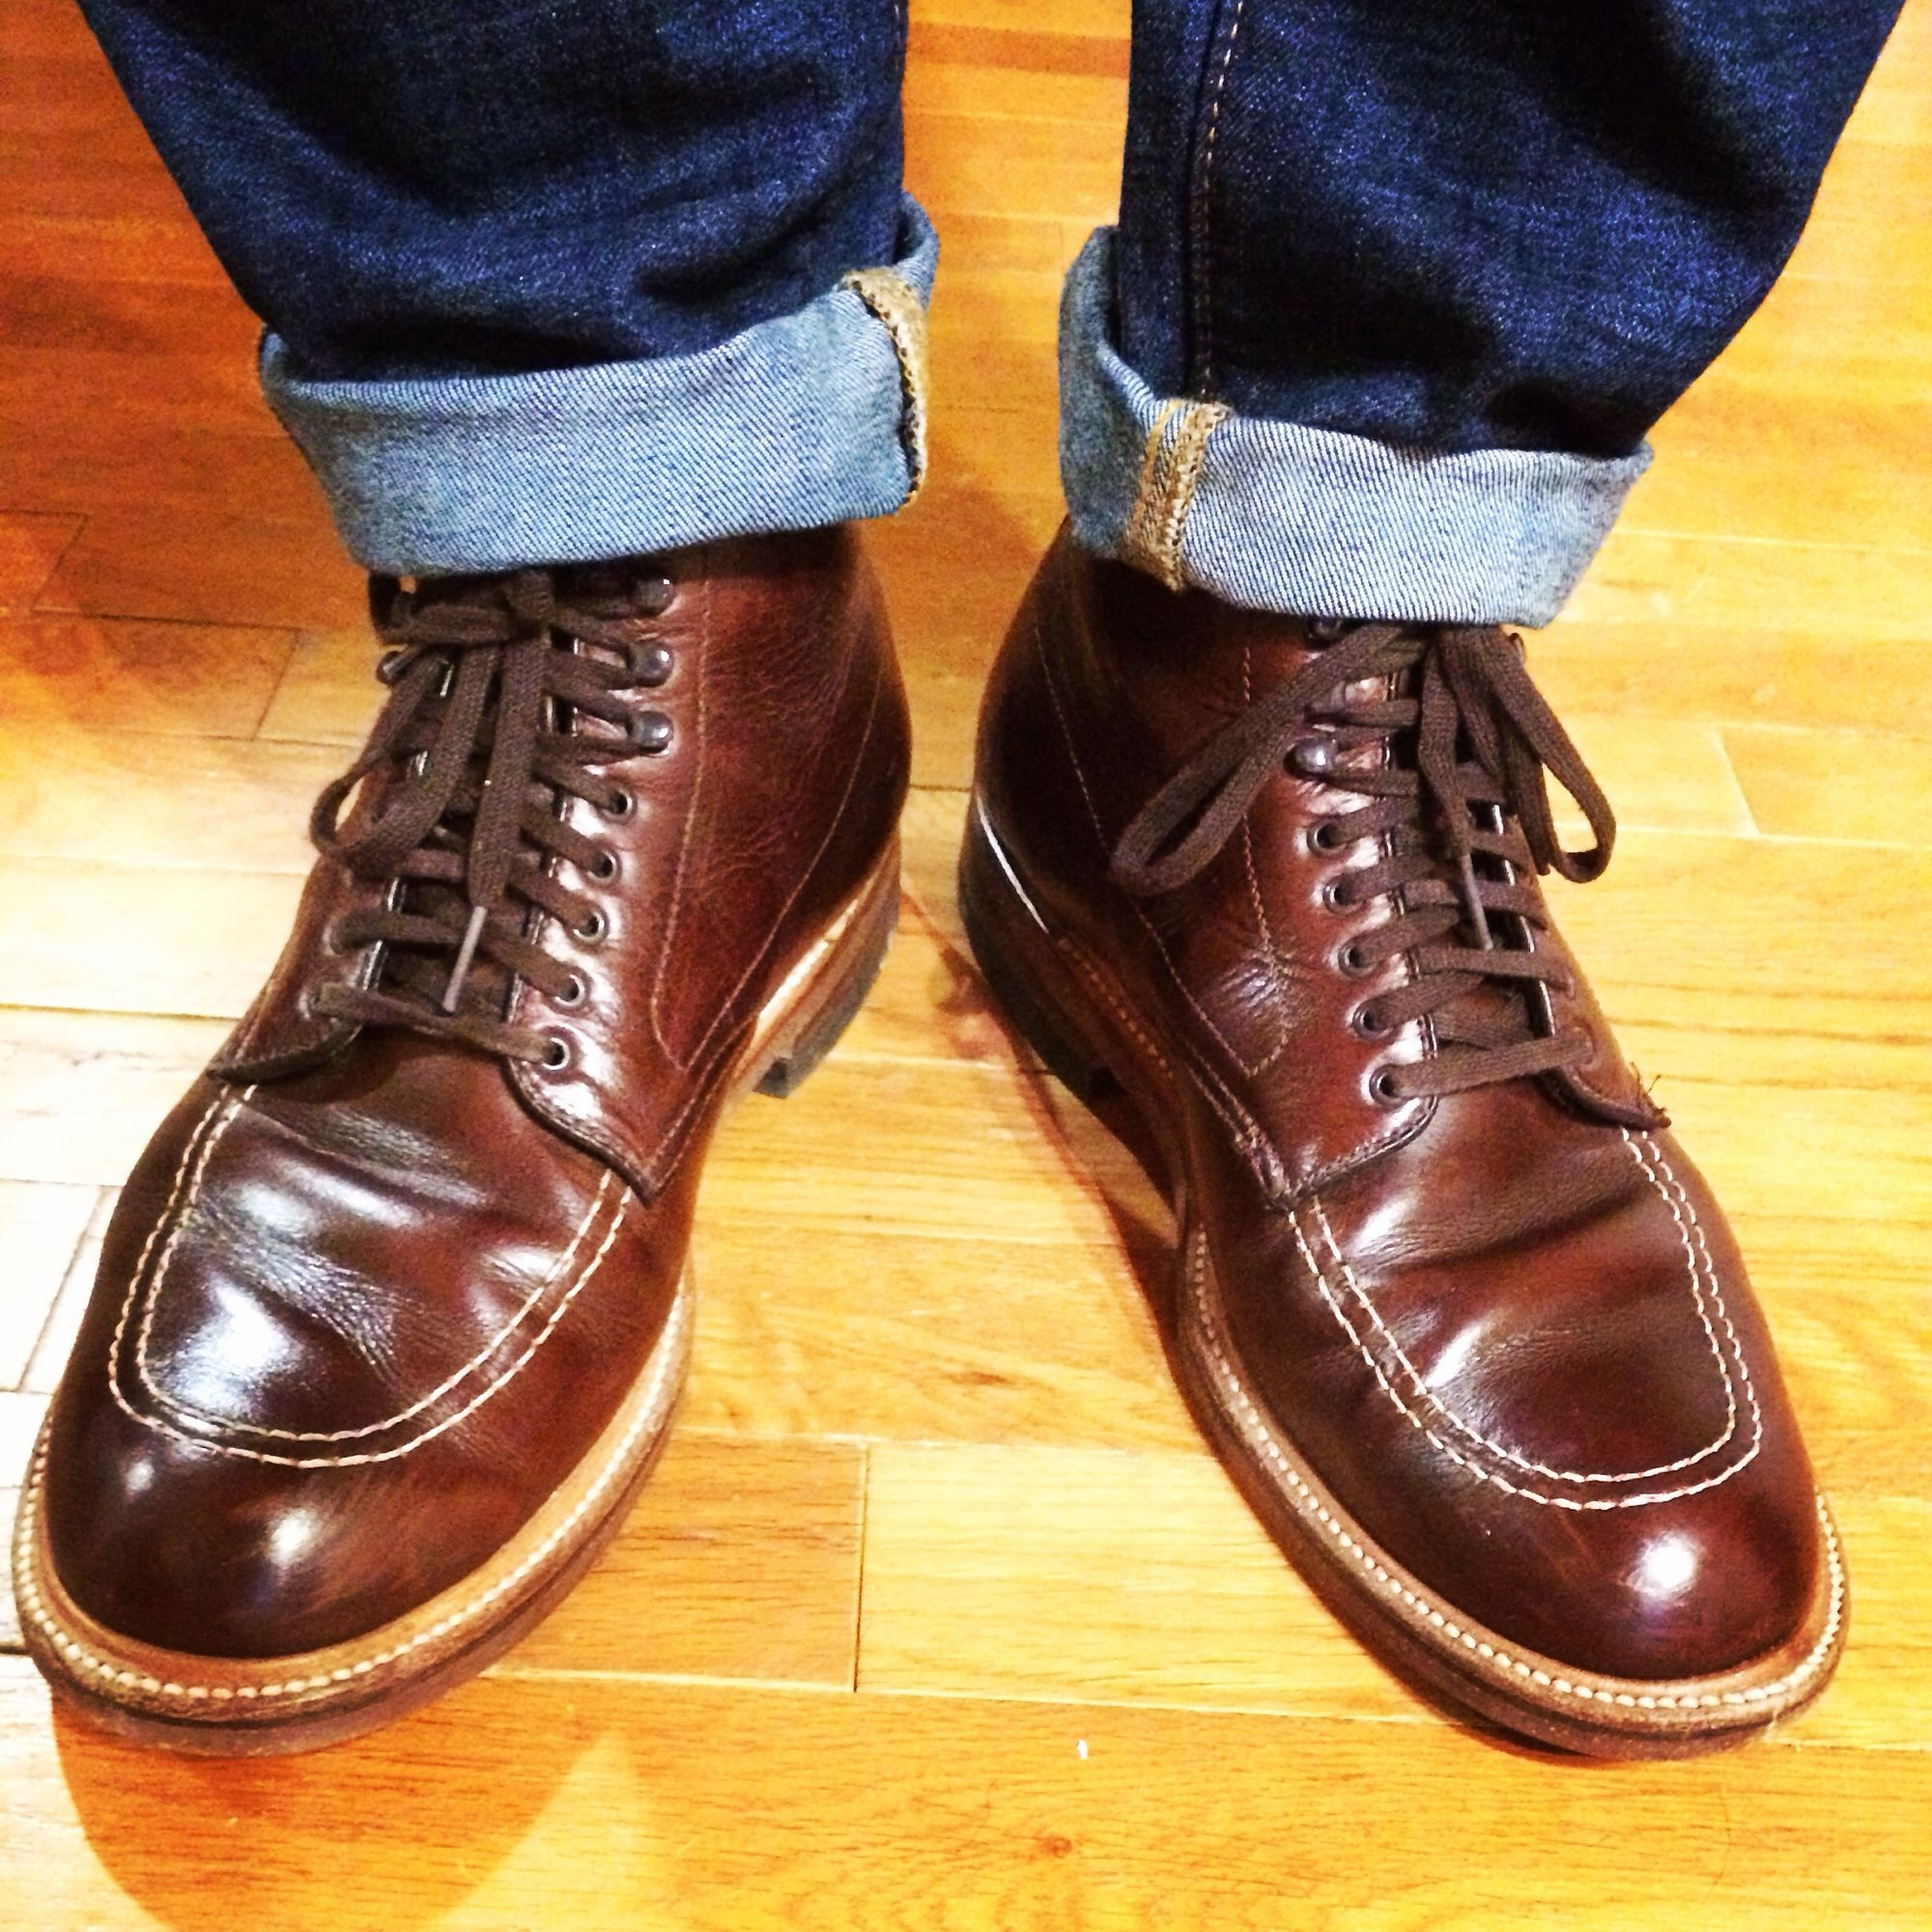 ted baker shoes styleforum epaulette definition of insanity